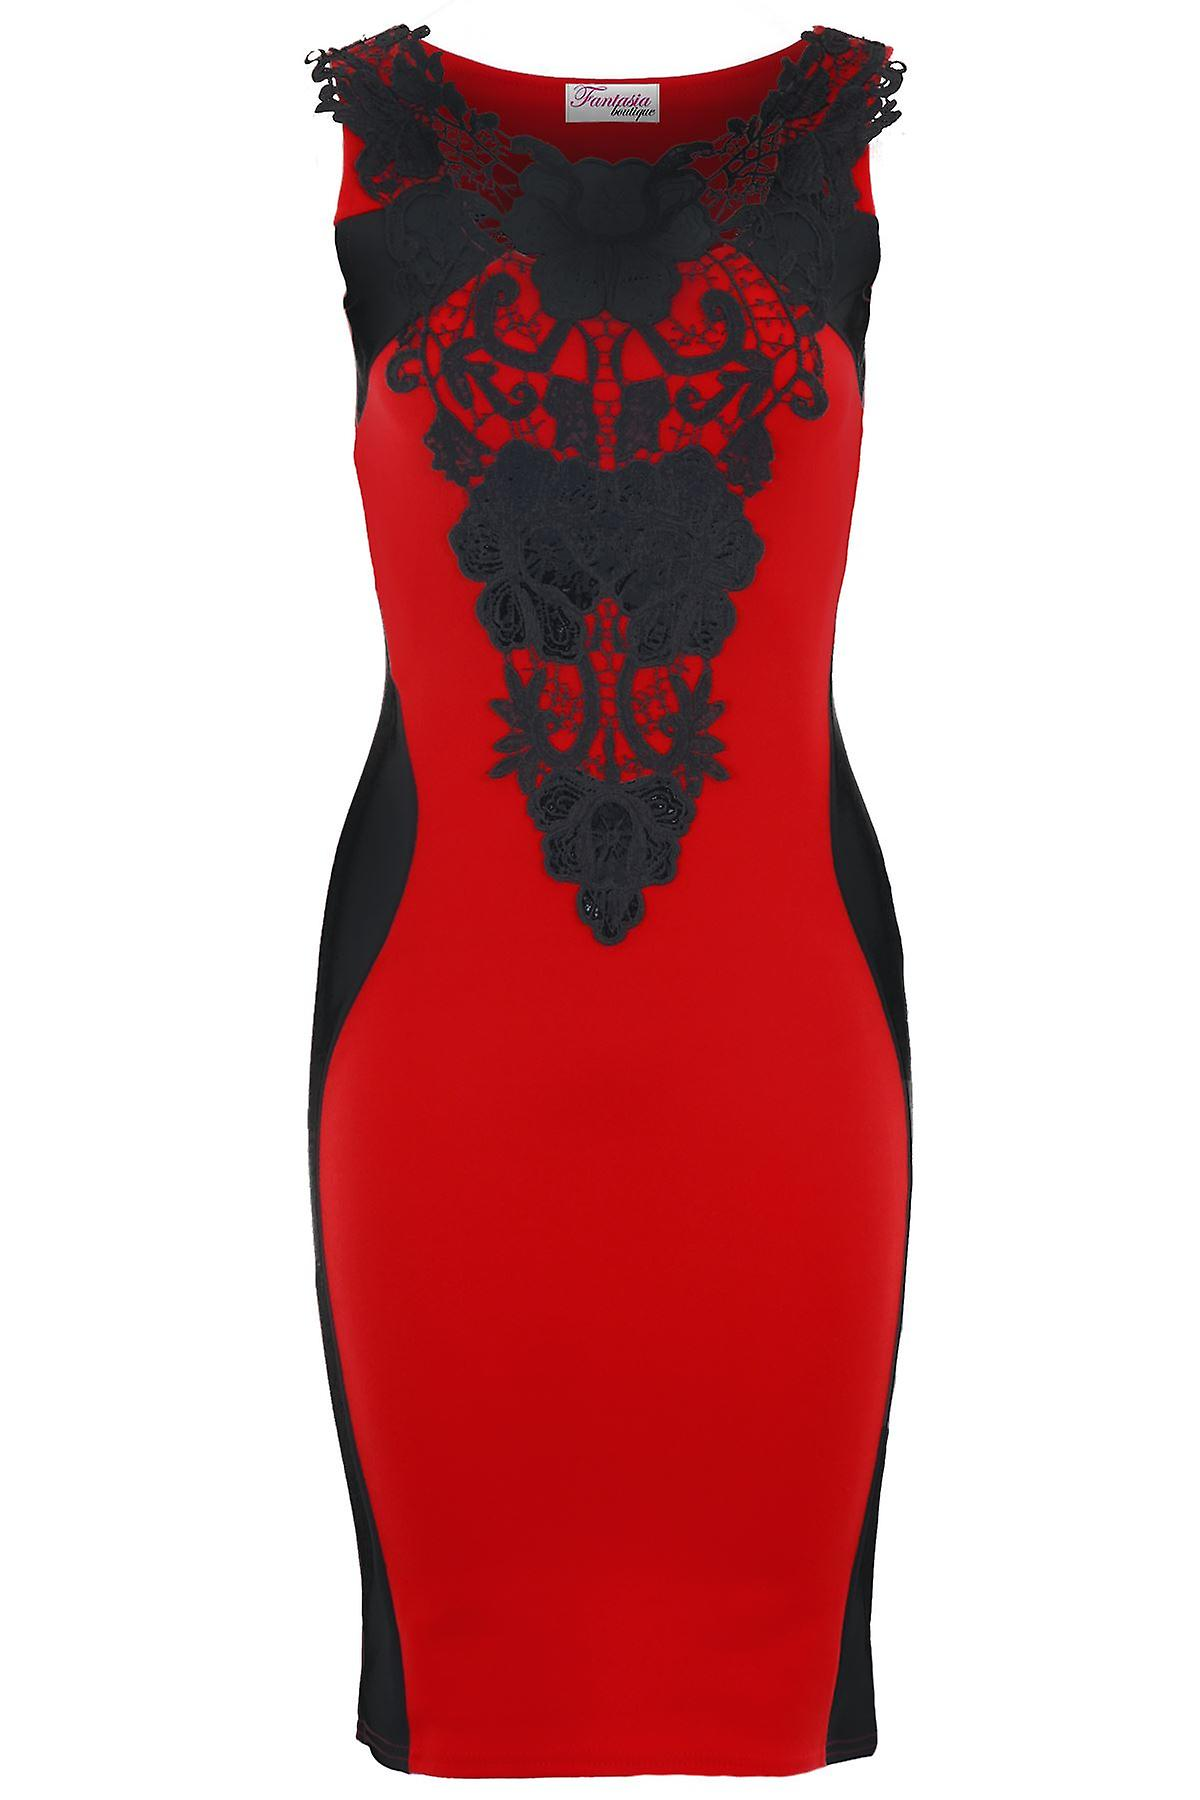 Ladies Crochet Neck Slimming Effect Panel Bodycon Midi Knee Length Dress